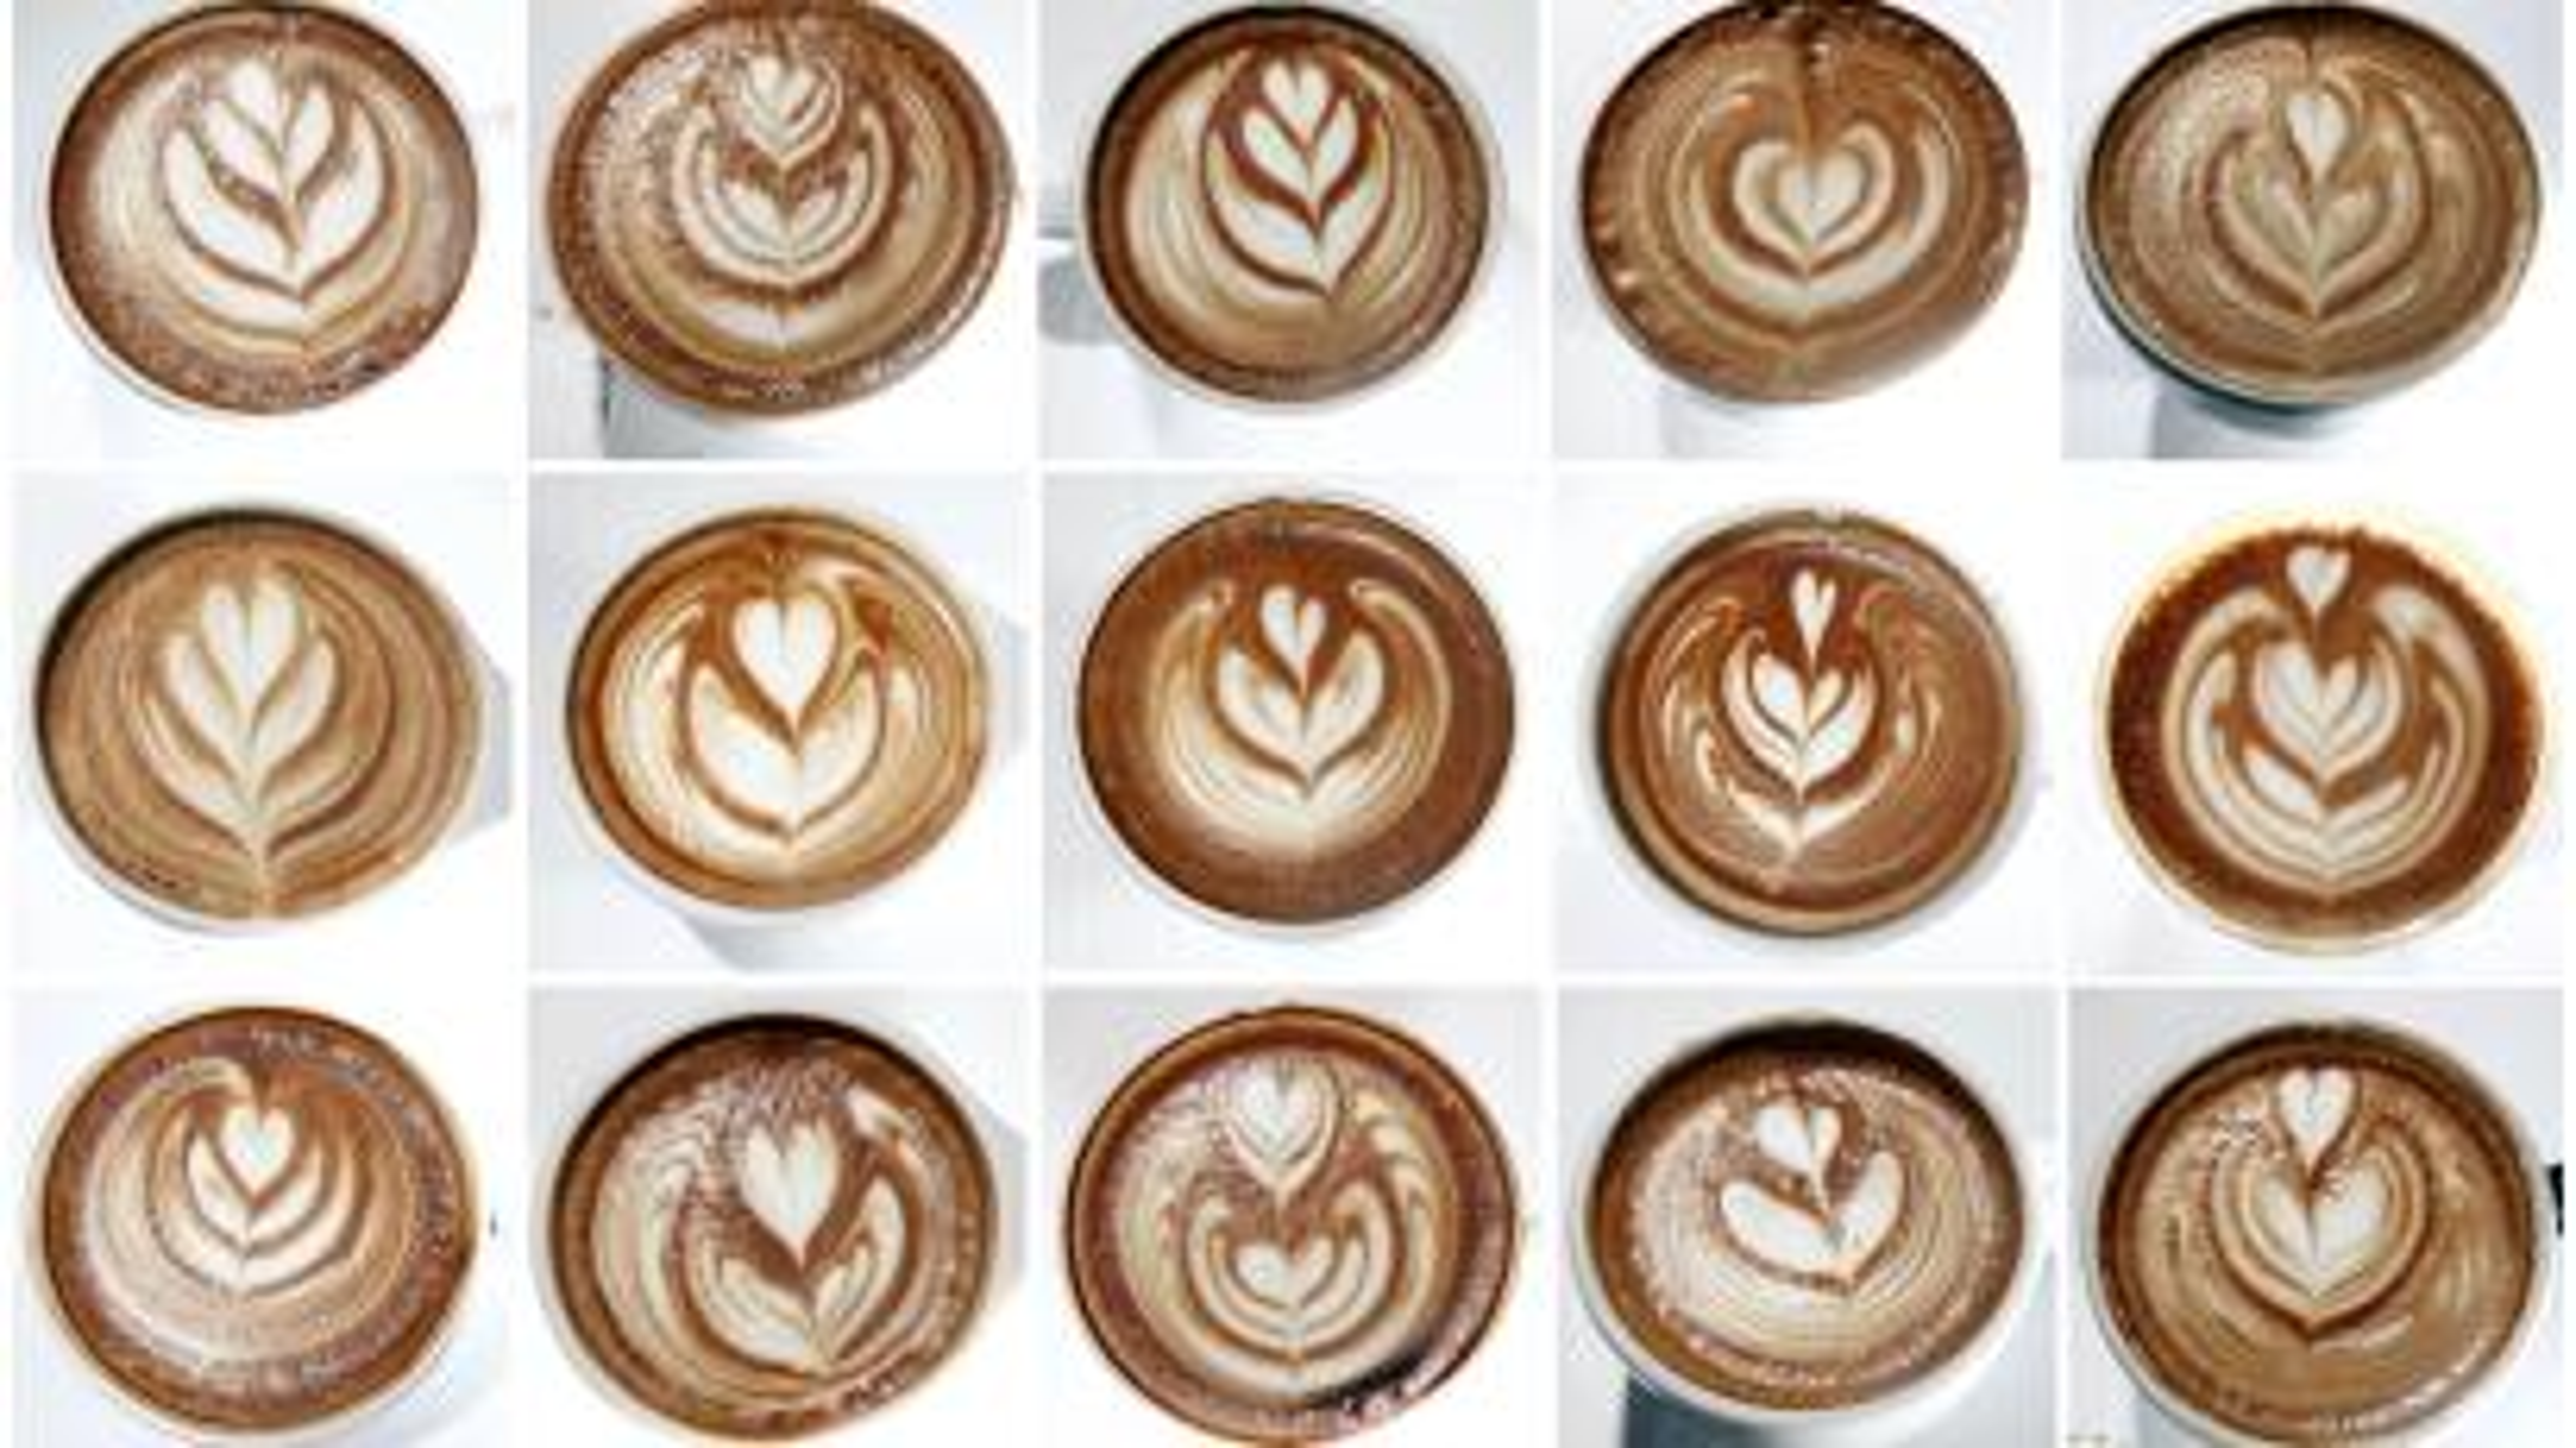 Starbucks Flat White Coffee